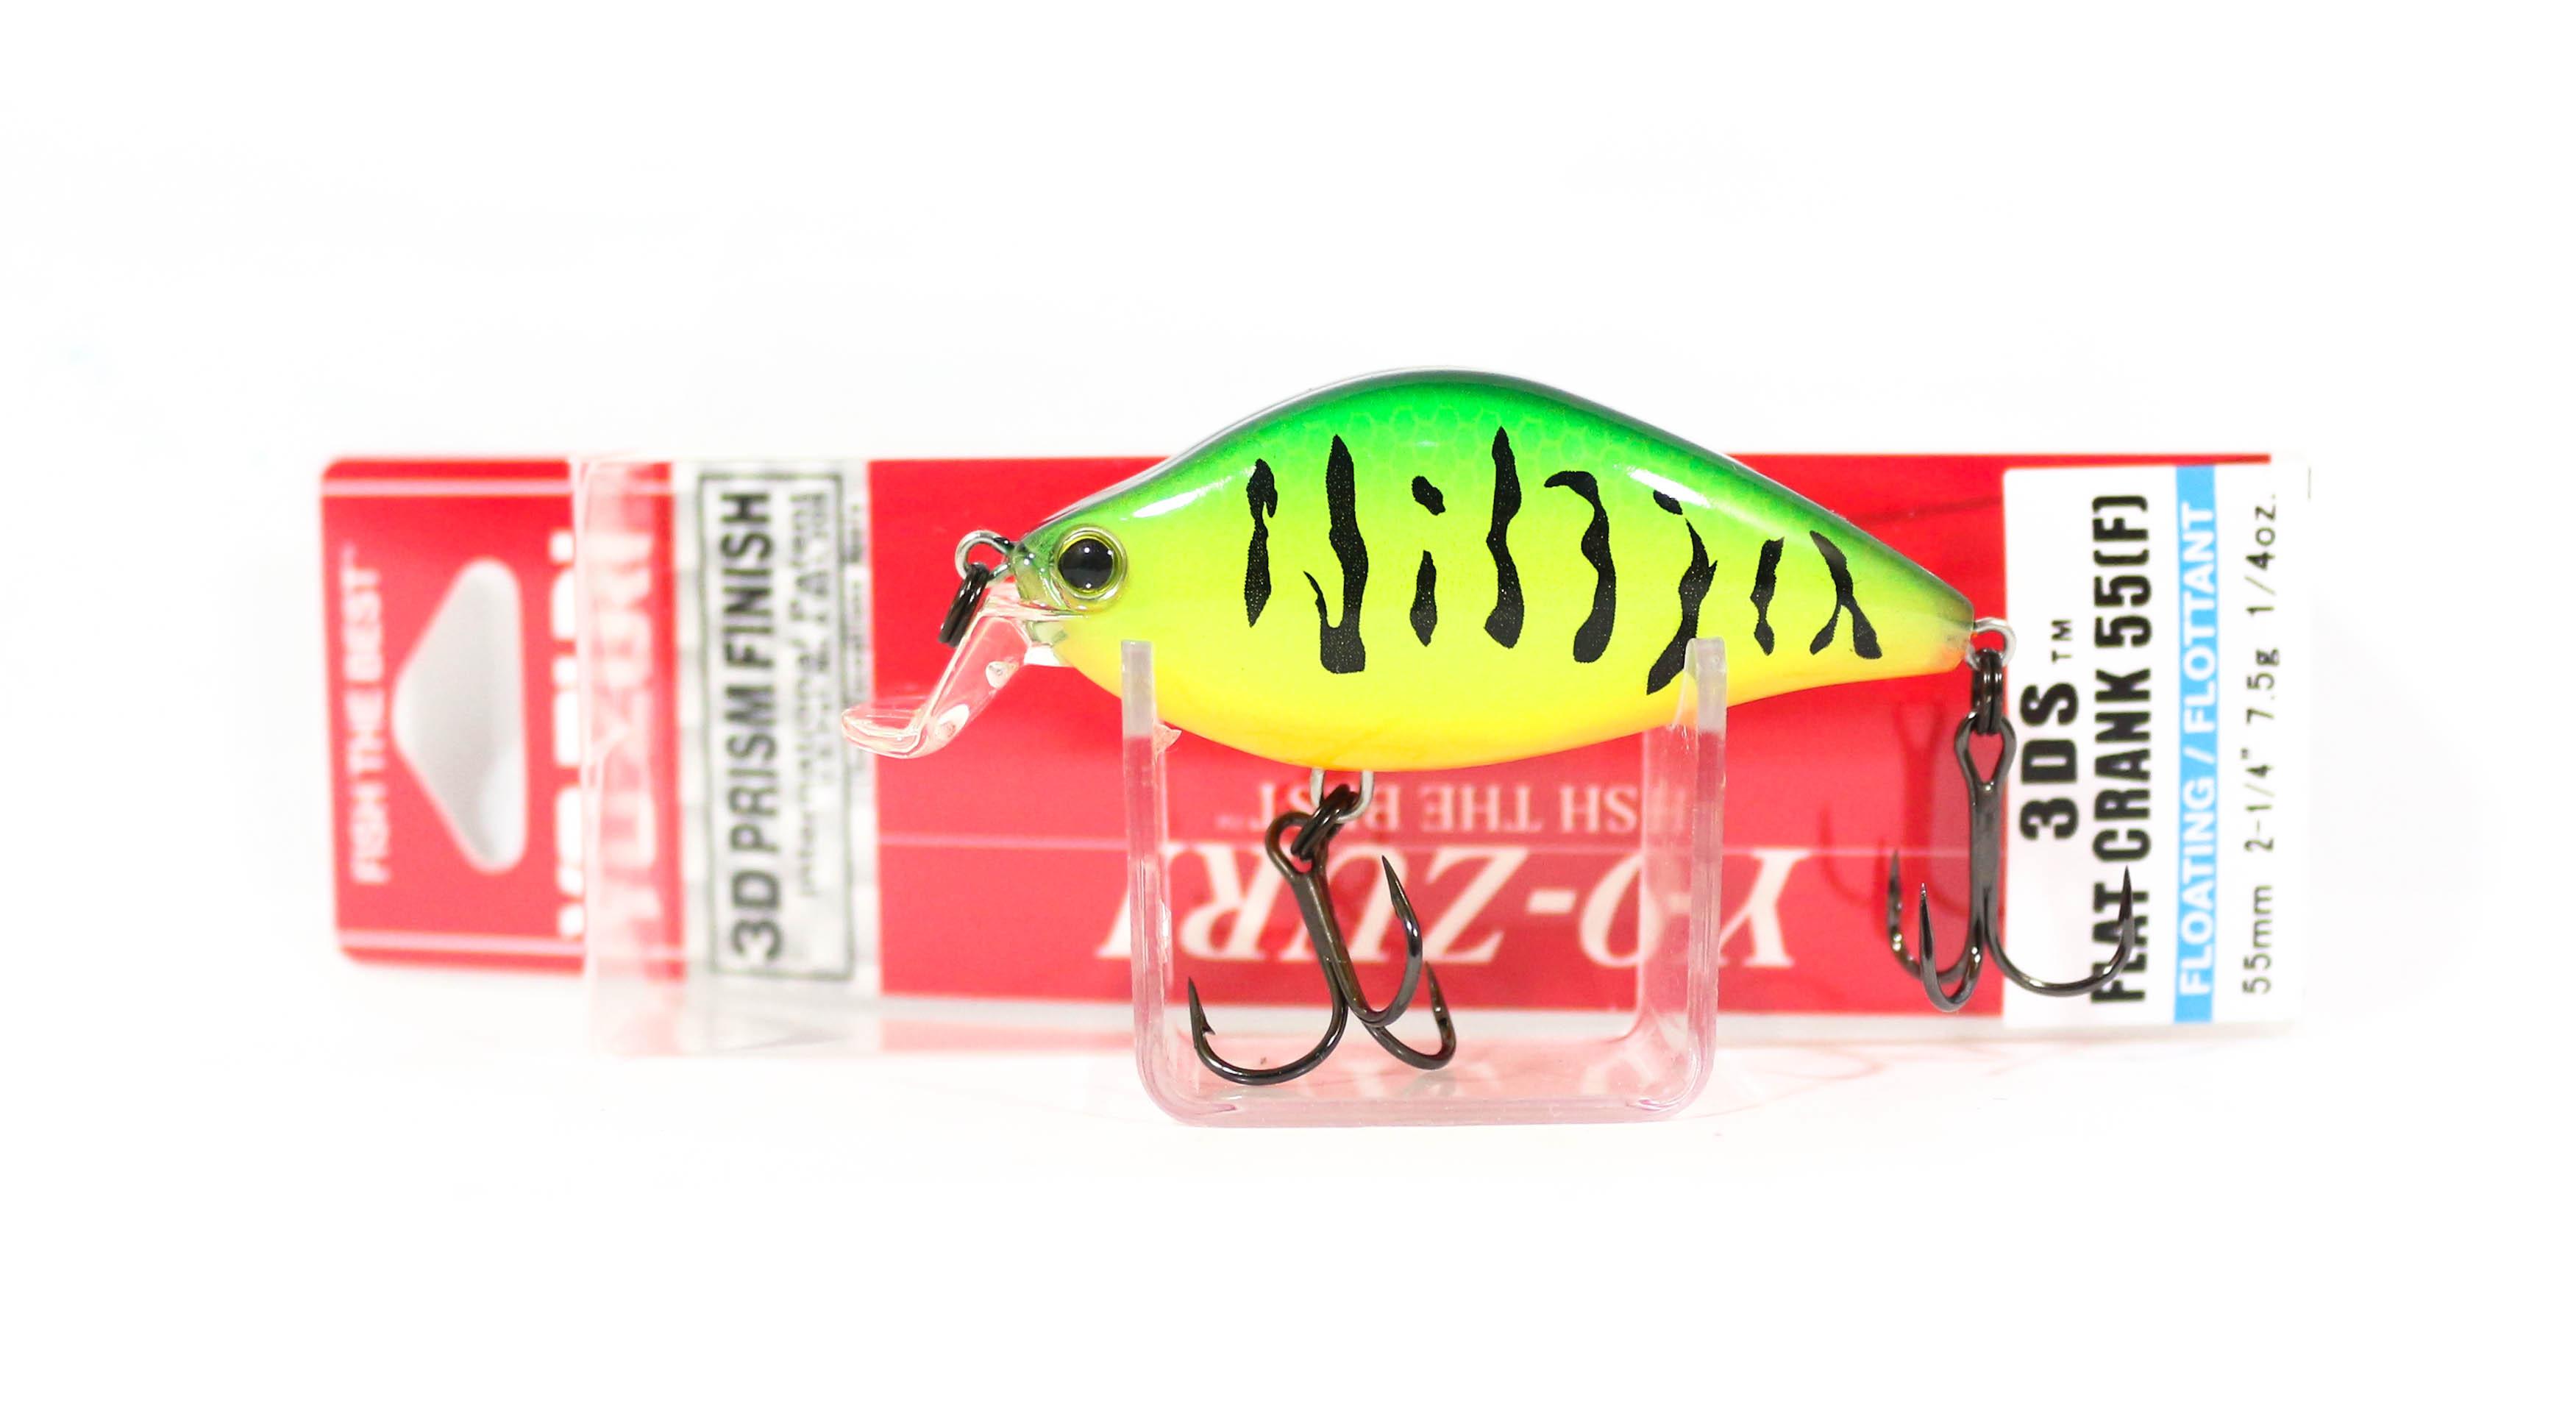 3767 Yo Zuri Duel 3DS MR 50F Crank Bait Floating Lure F1140-HGBL